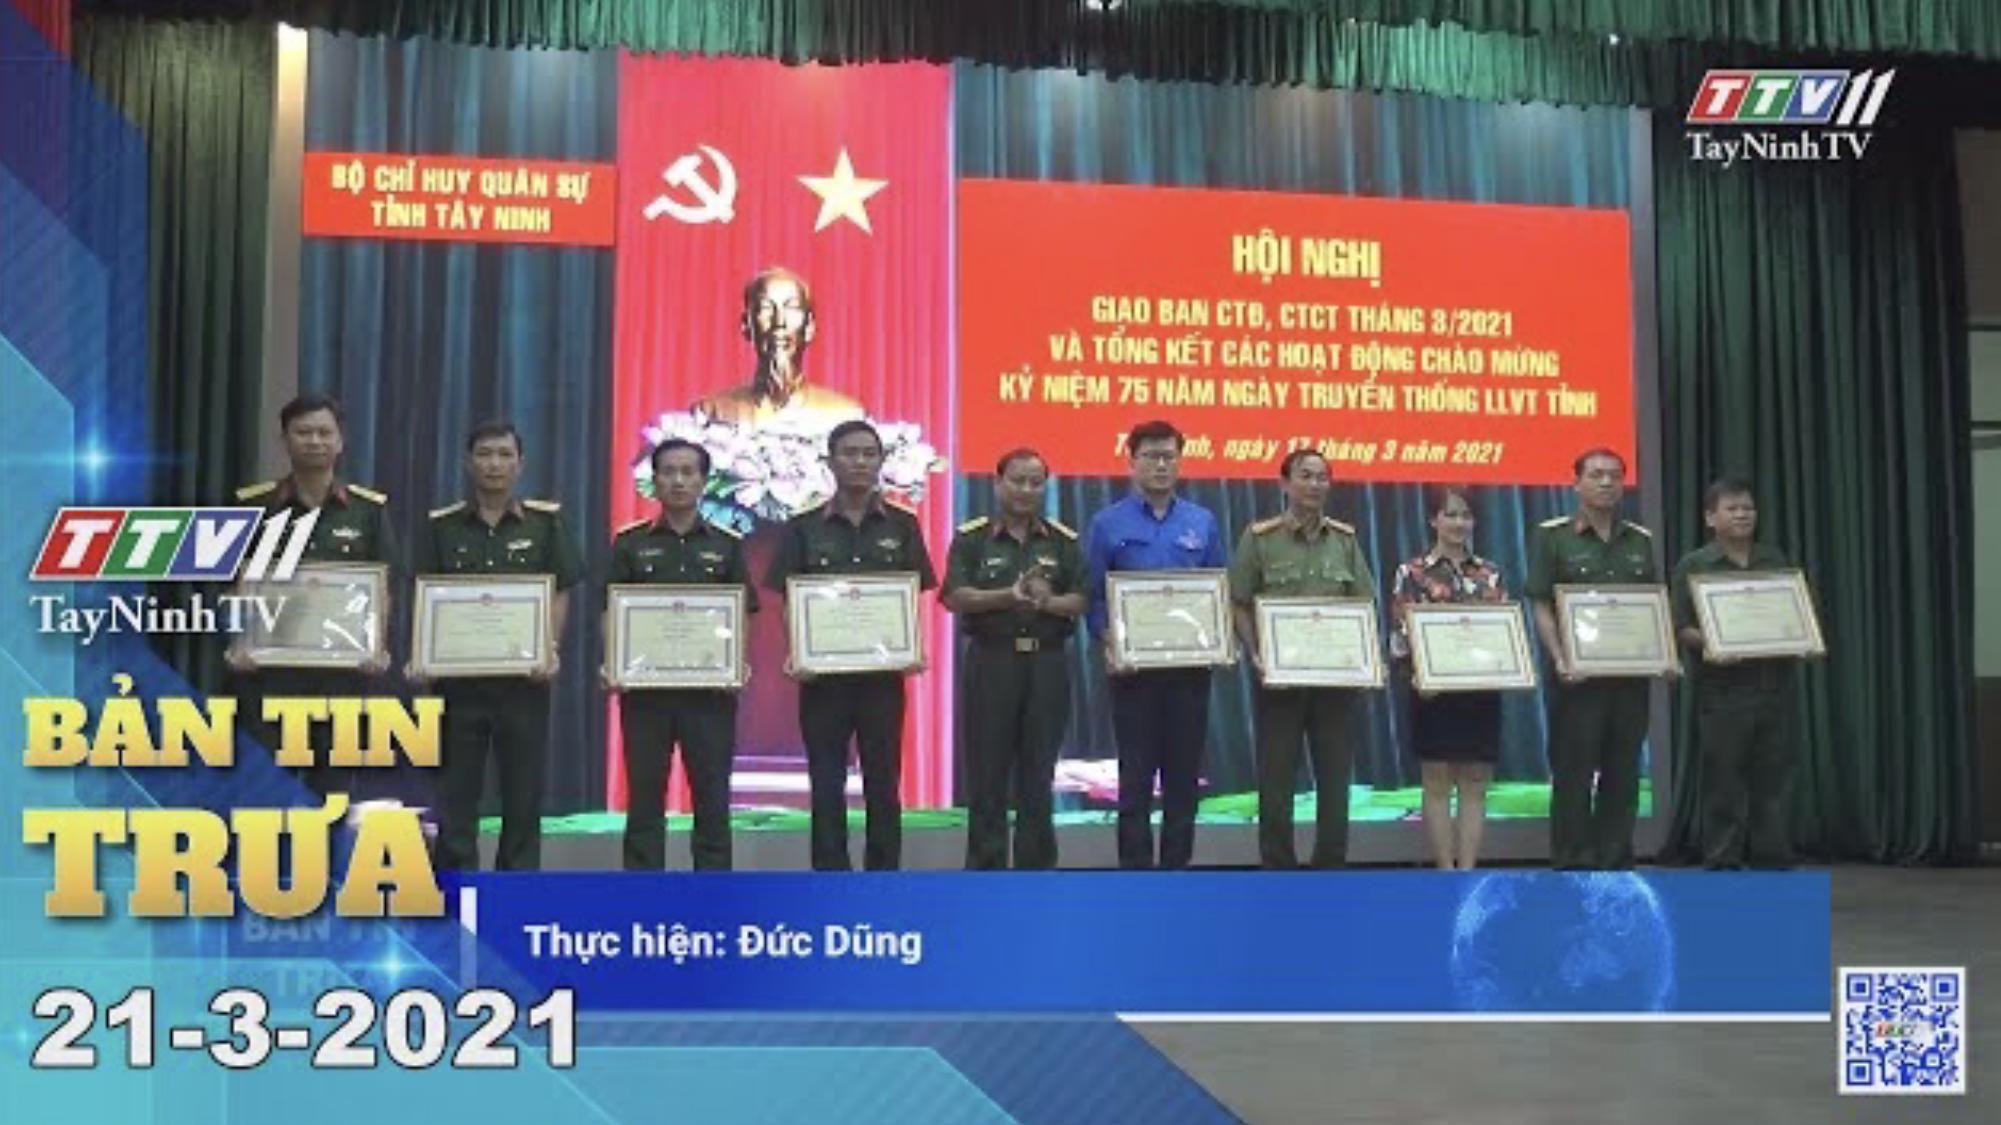 Bản tin trưa 21-3-2021 | Tin tức hôm nay | TayNinhTV